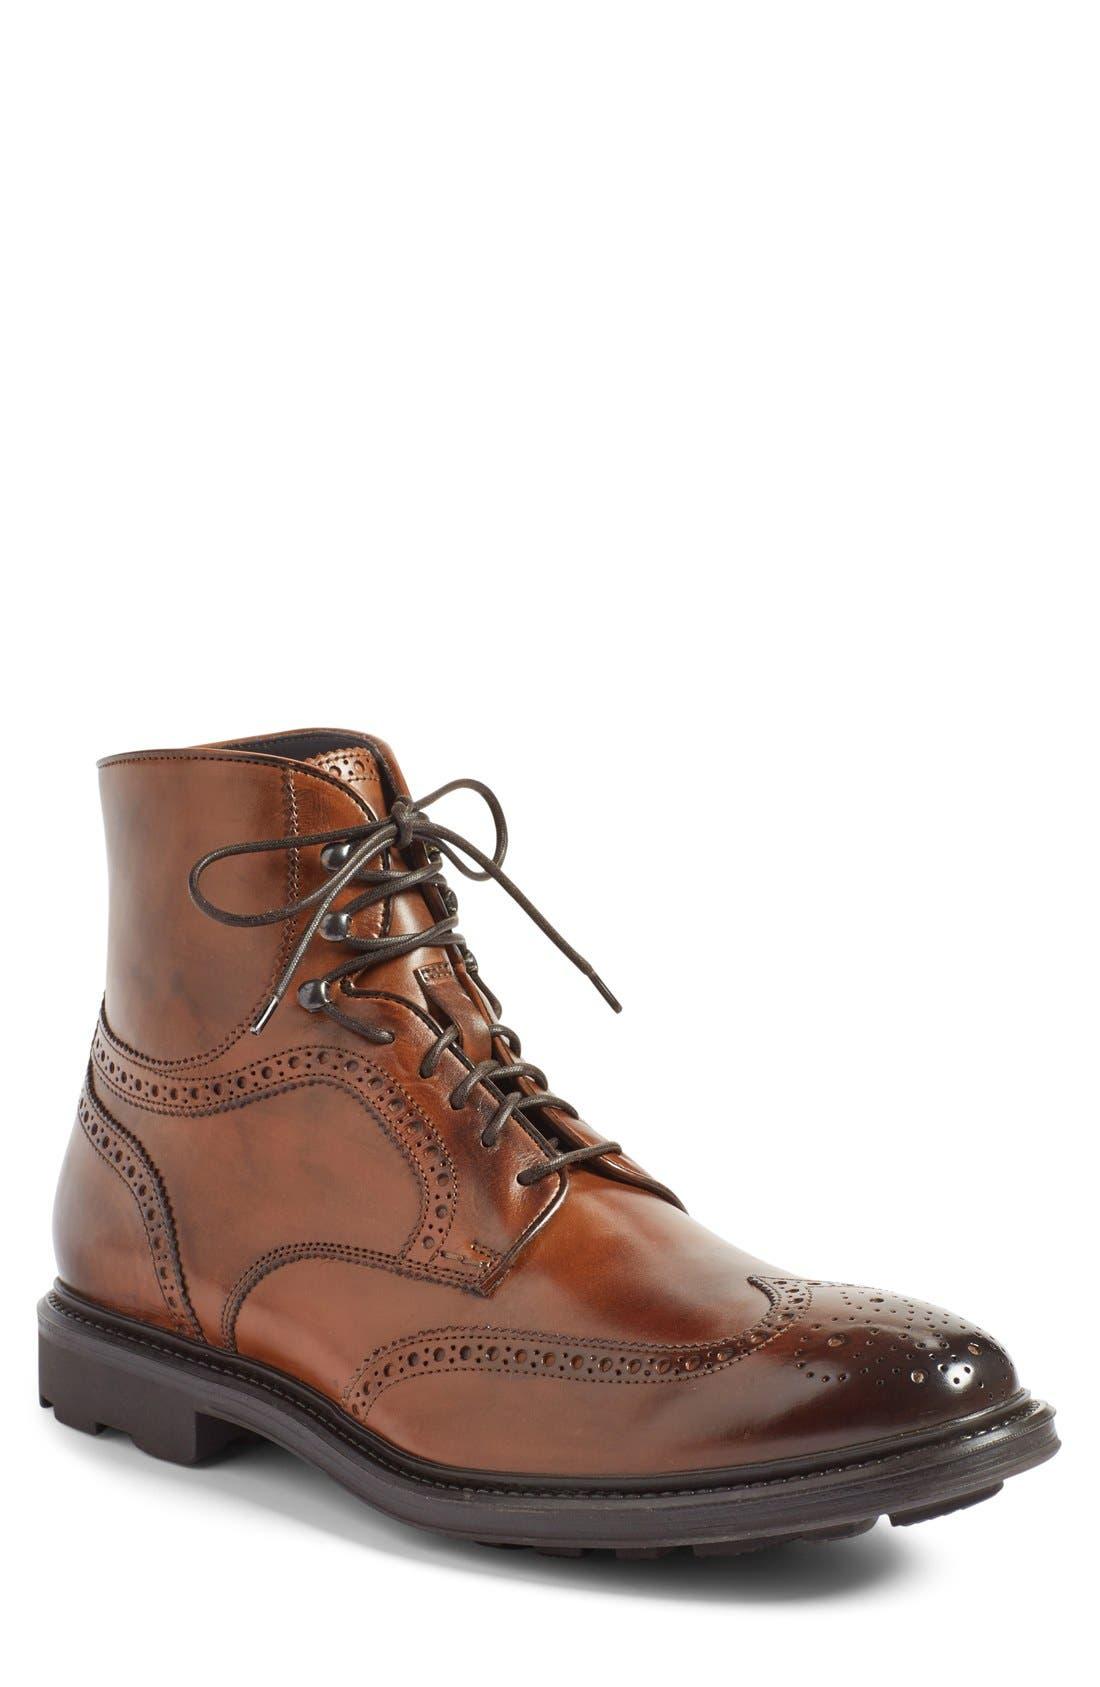 Main Image - To Boot New York 'Hobson' Wingtip Boot (Men)